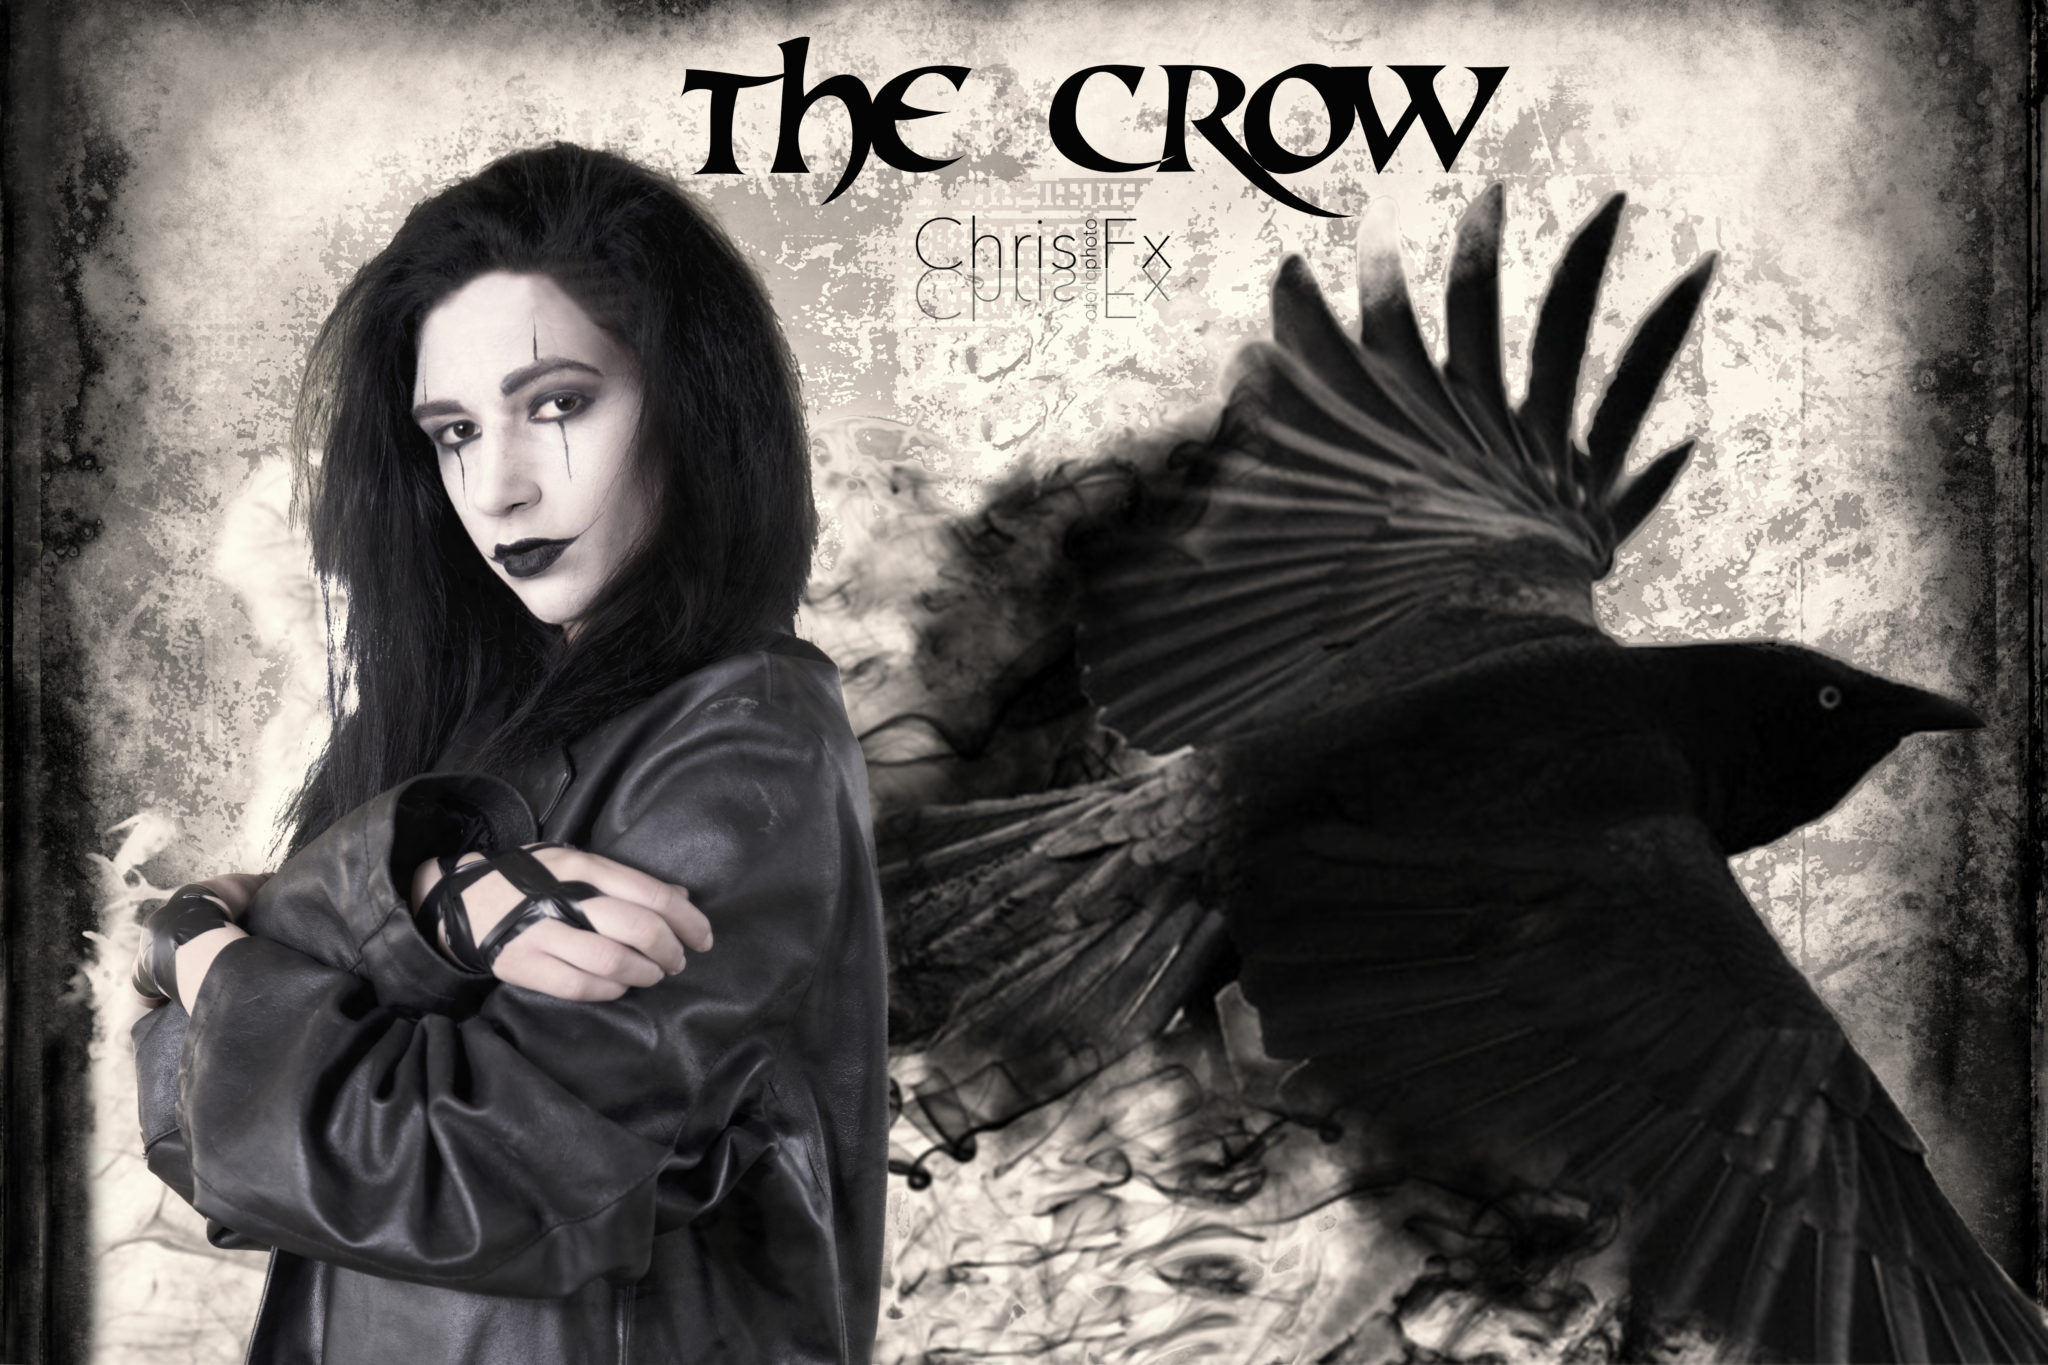 Chris Fx - the Crow